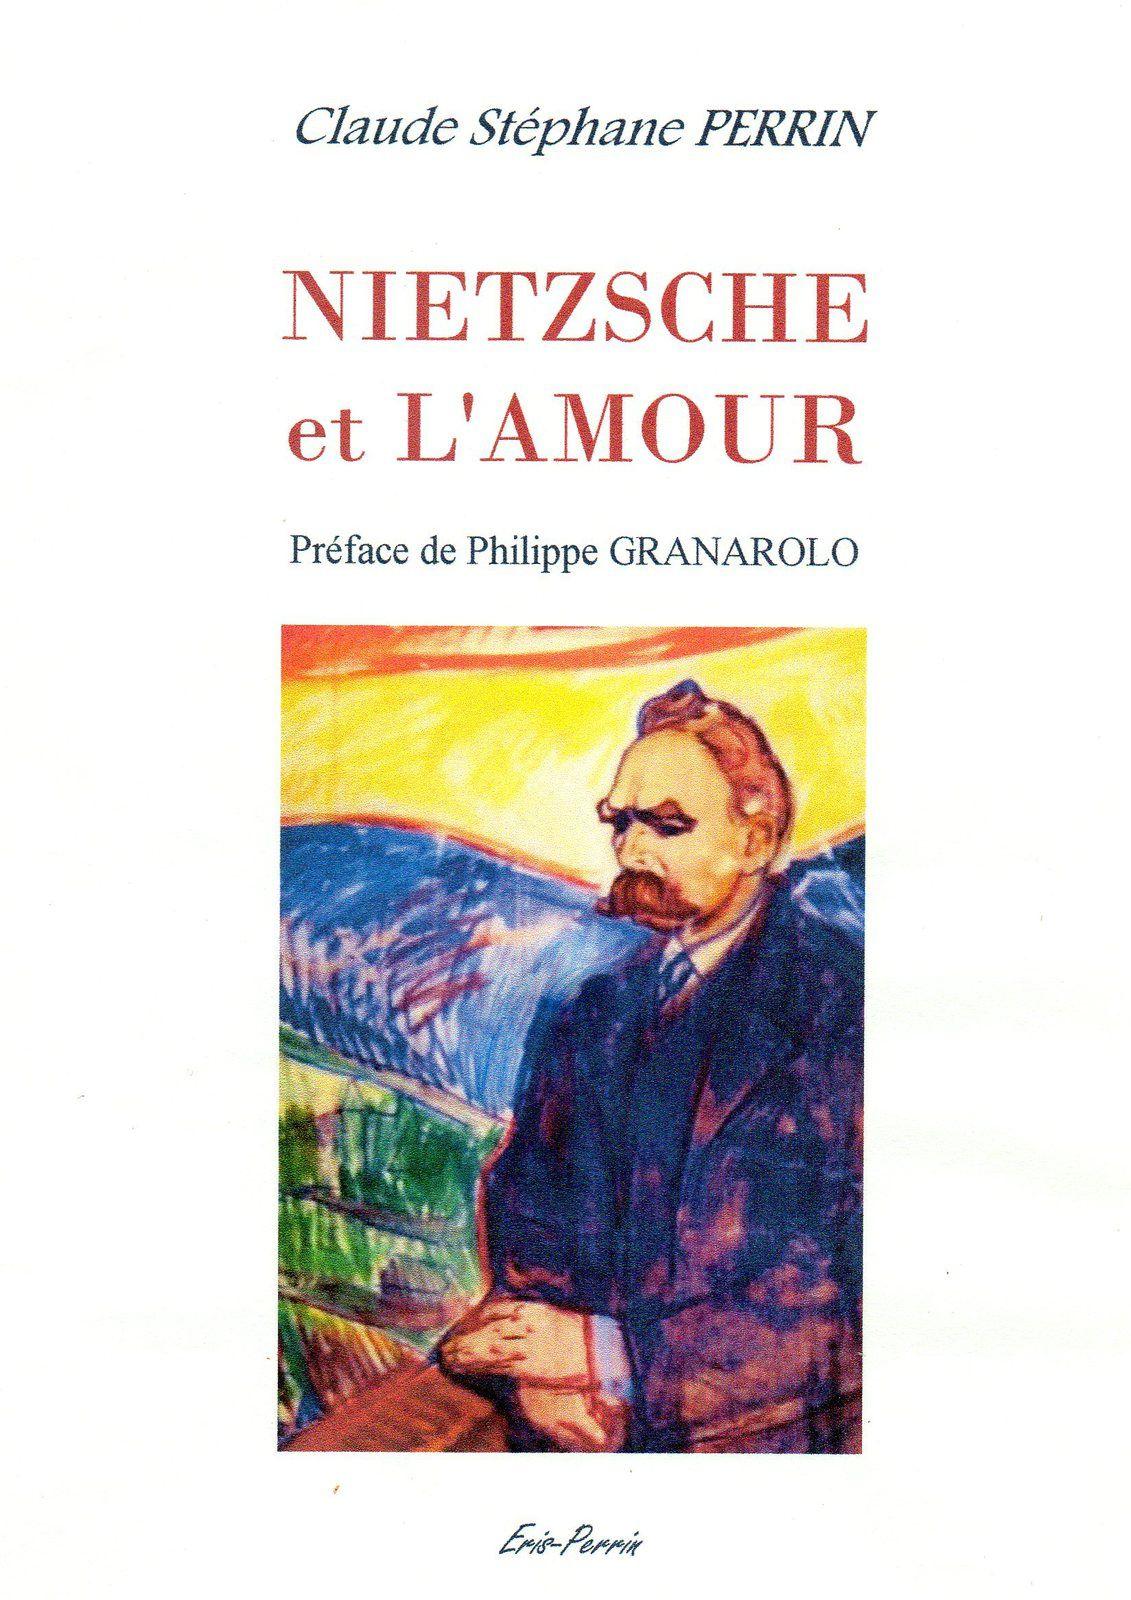 Biographie de Claude Stéphane PERRIN